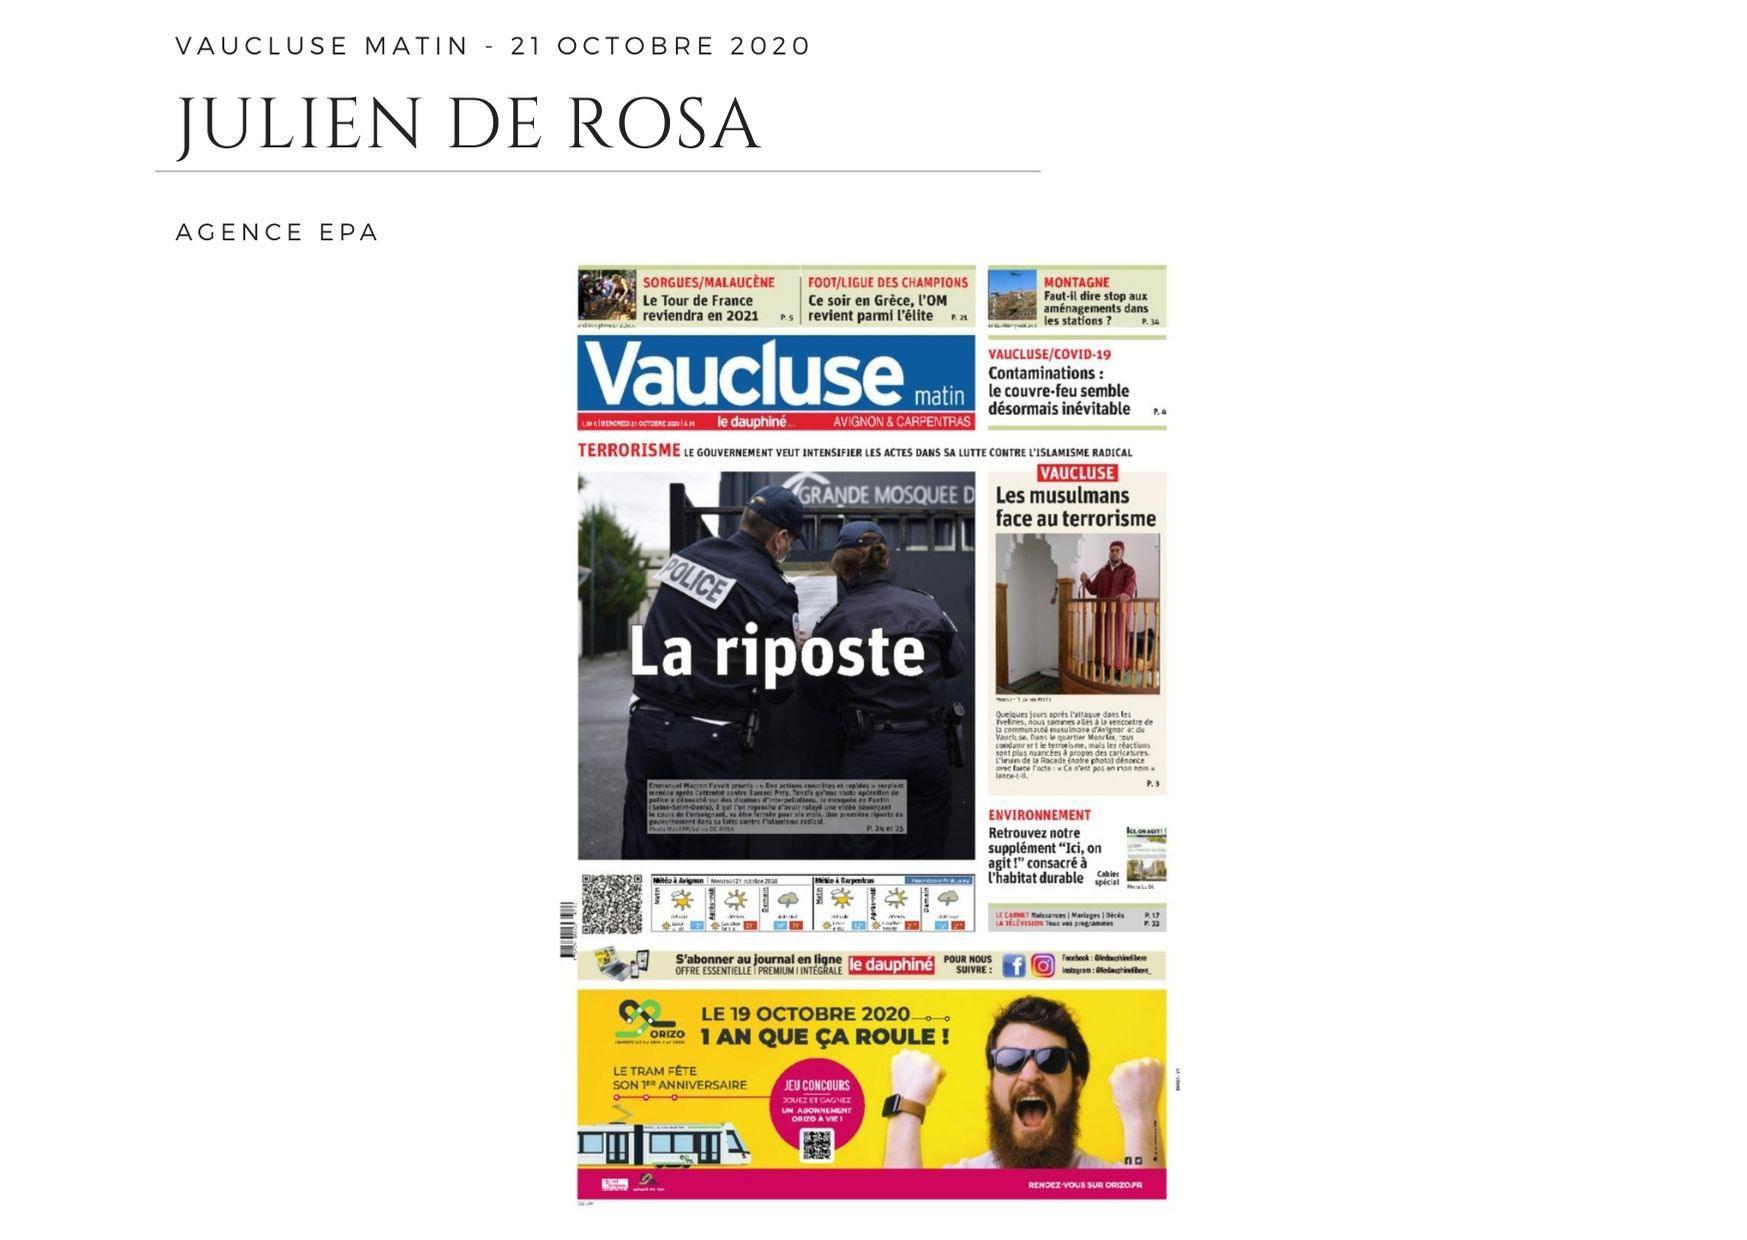 Vaucluse Matin - 21 octobre 2020